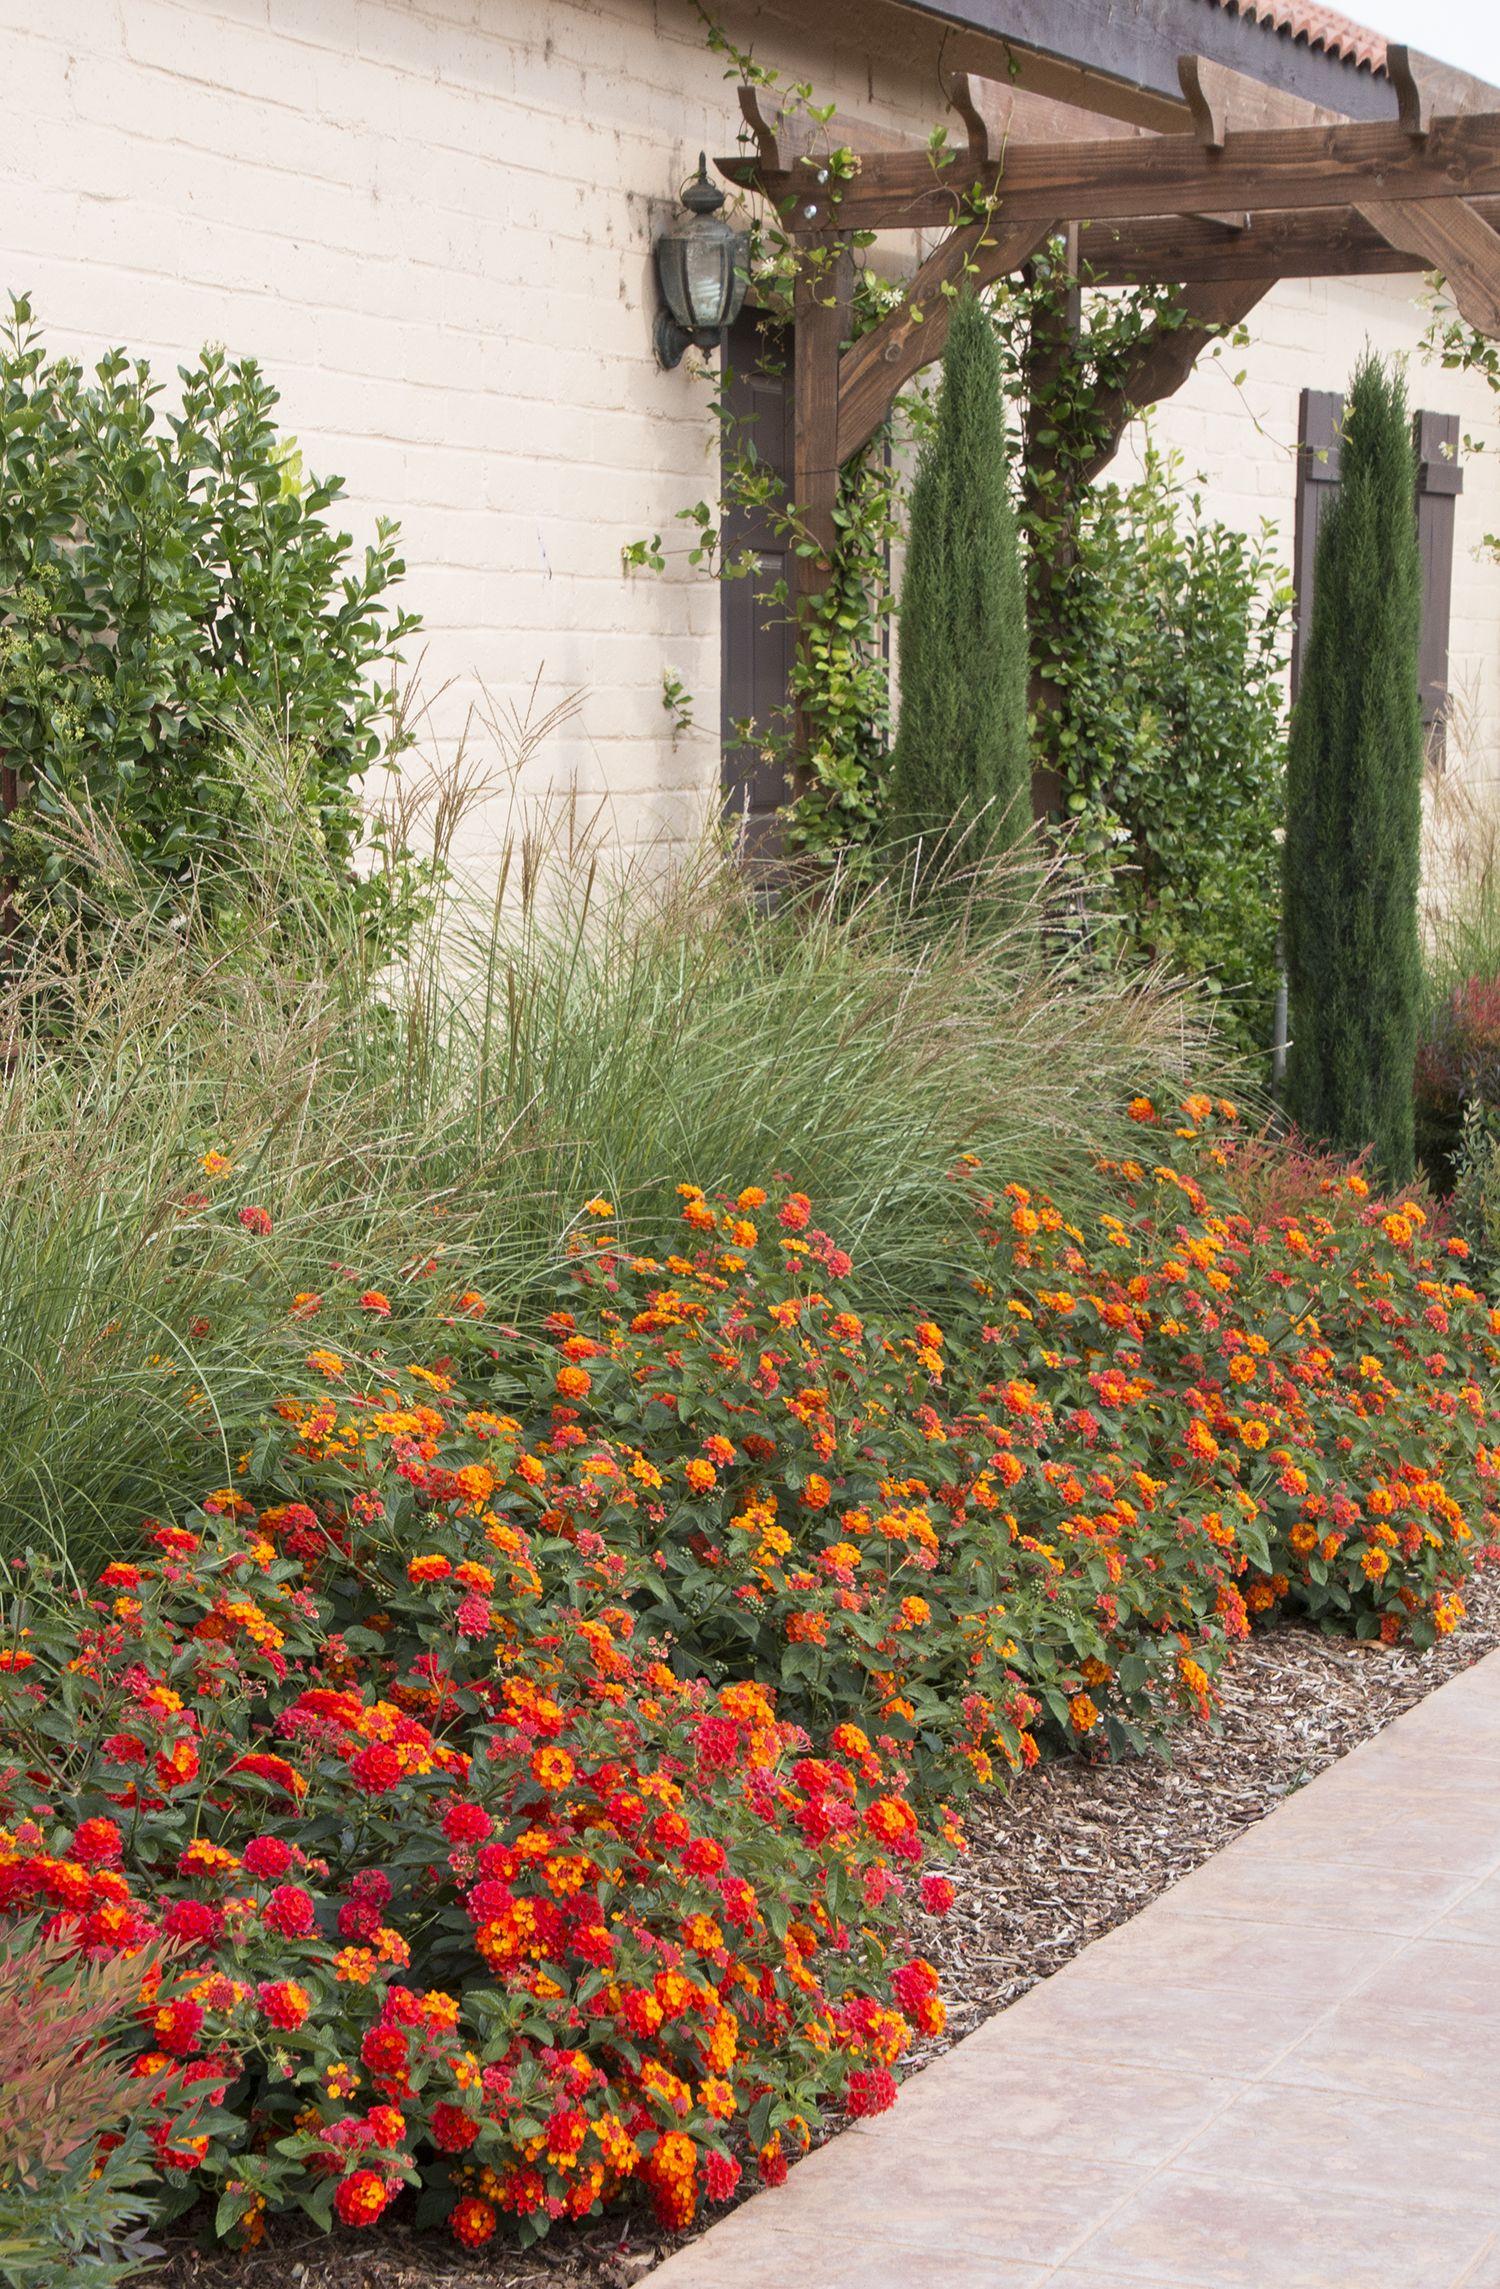 Dwarf Grasses Landscaping Dwarf maiden grass texas lantana how do your flowers grow dwarf maiden grass texas lantana workwithnaturefo